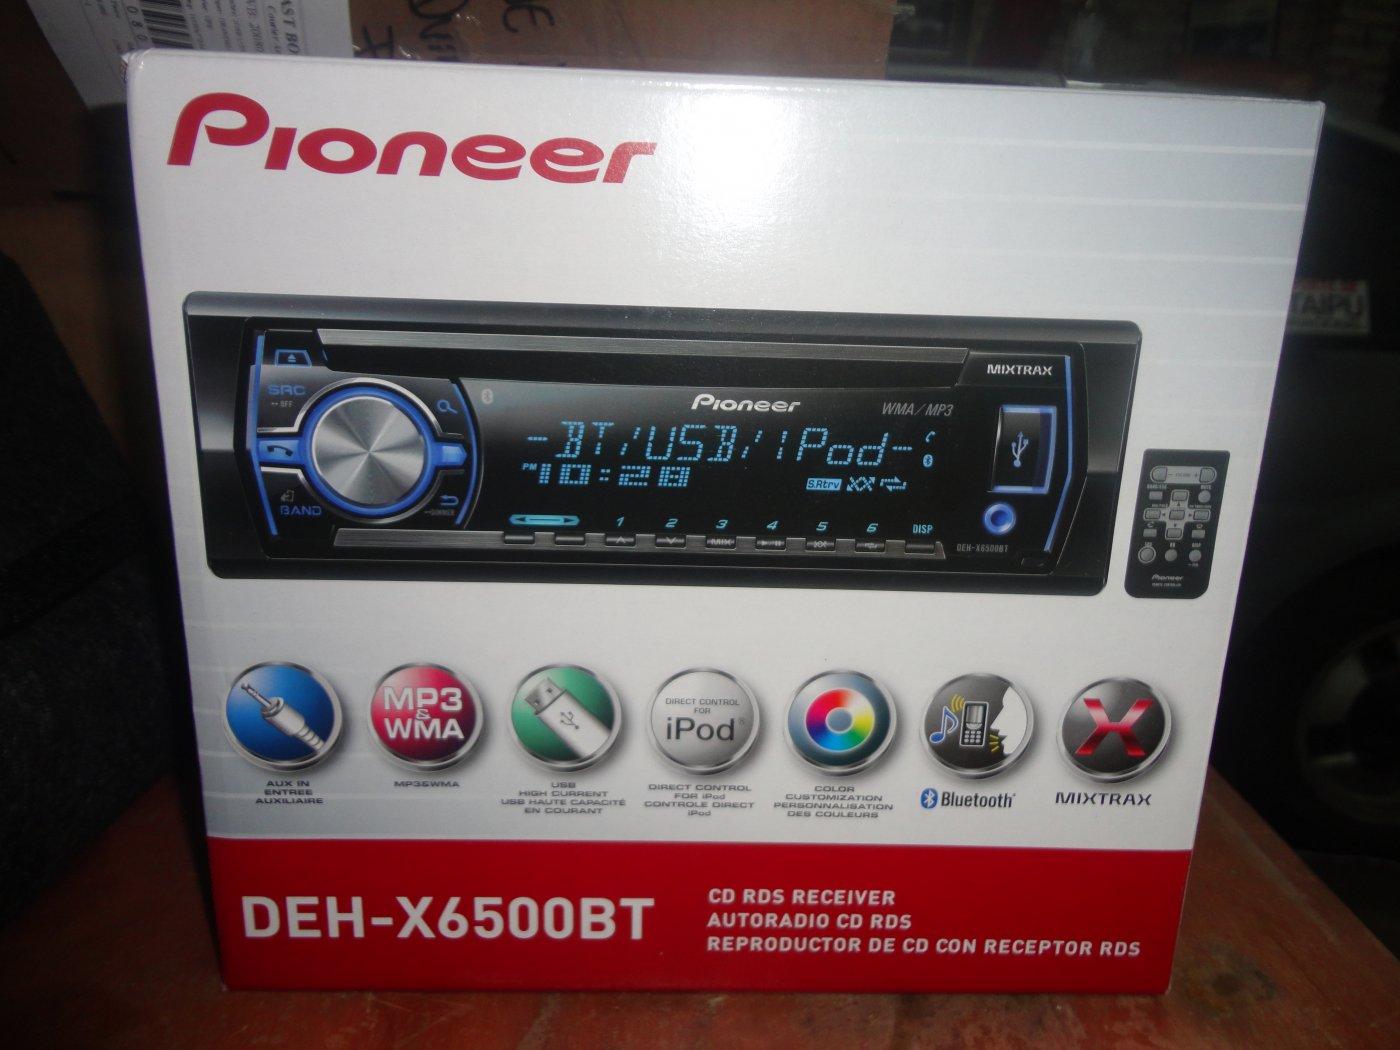 DSC02219.JPG